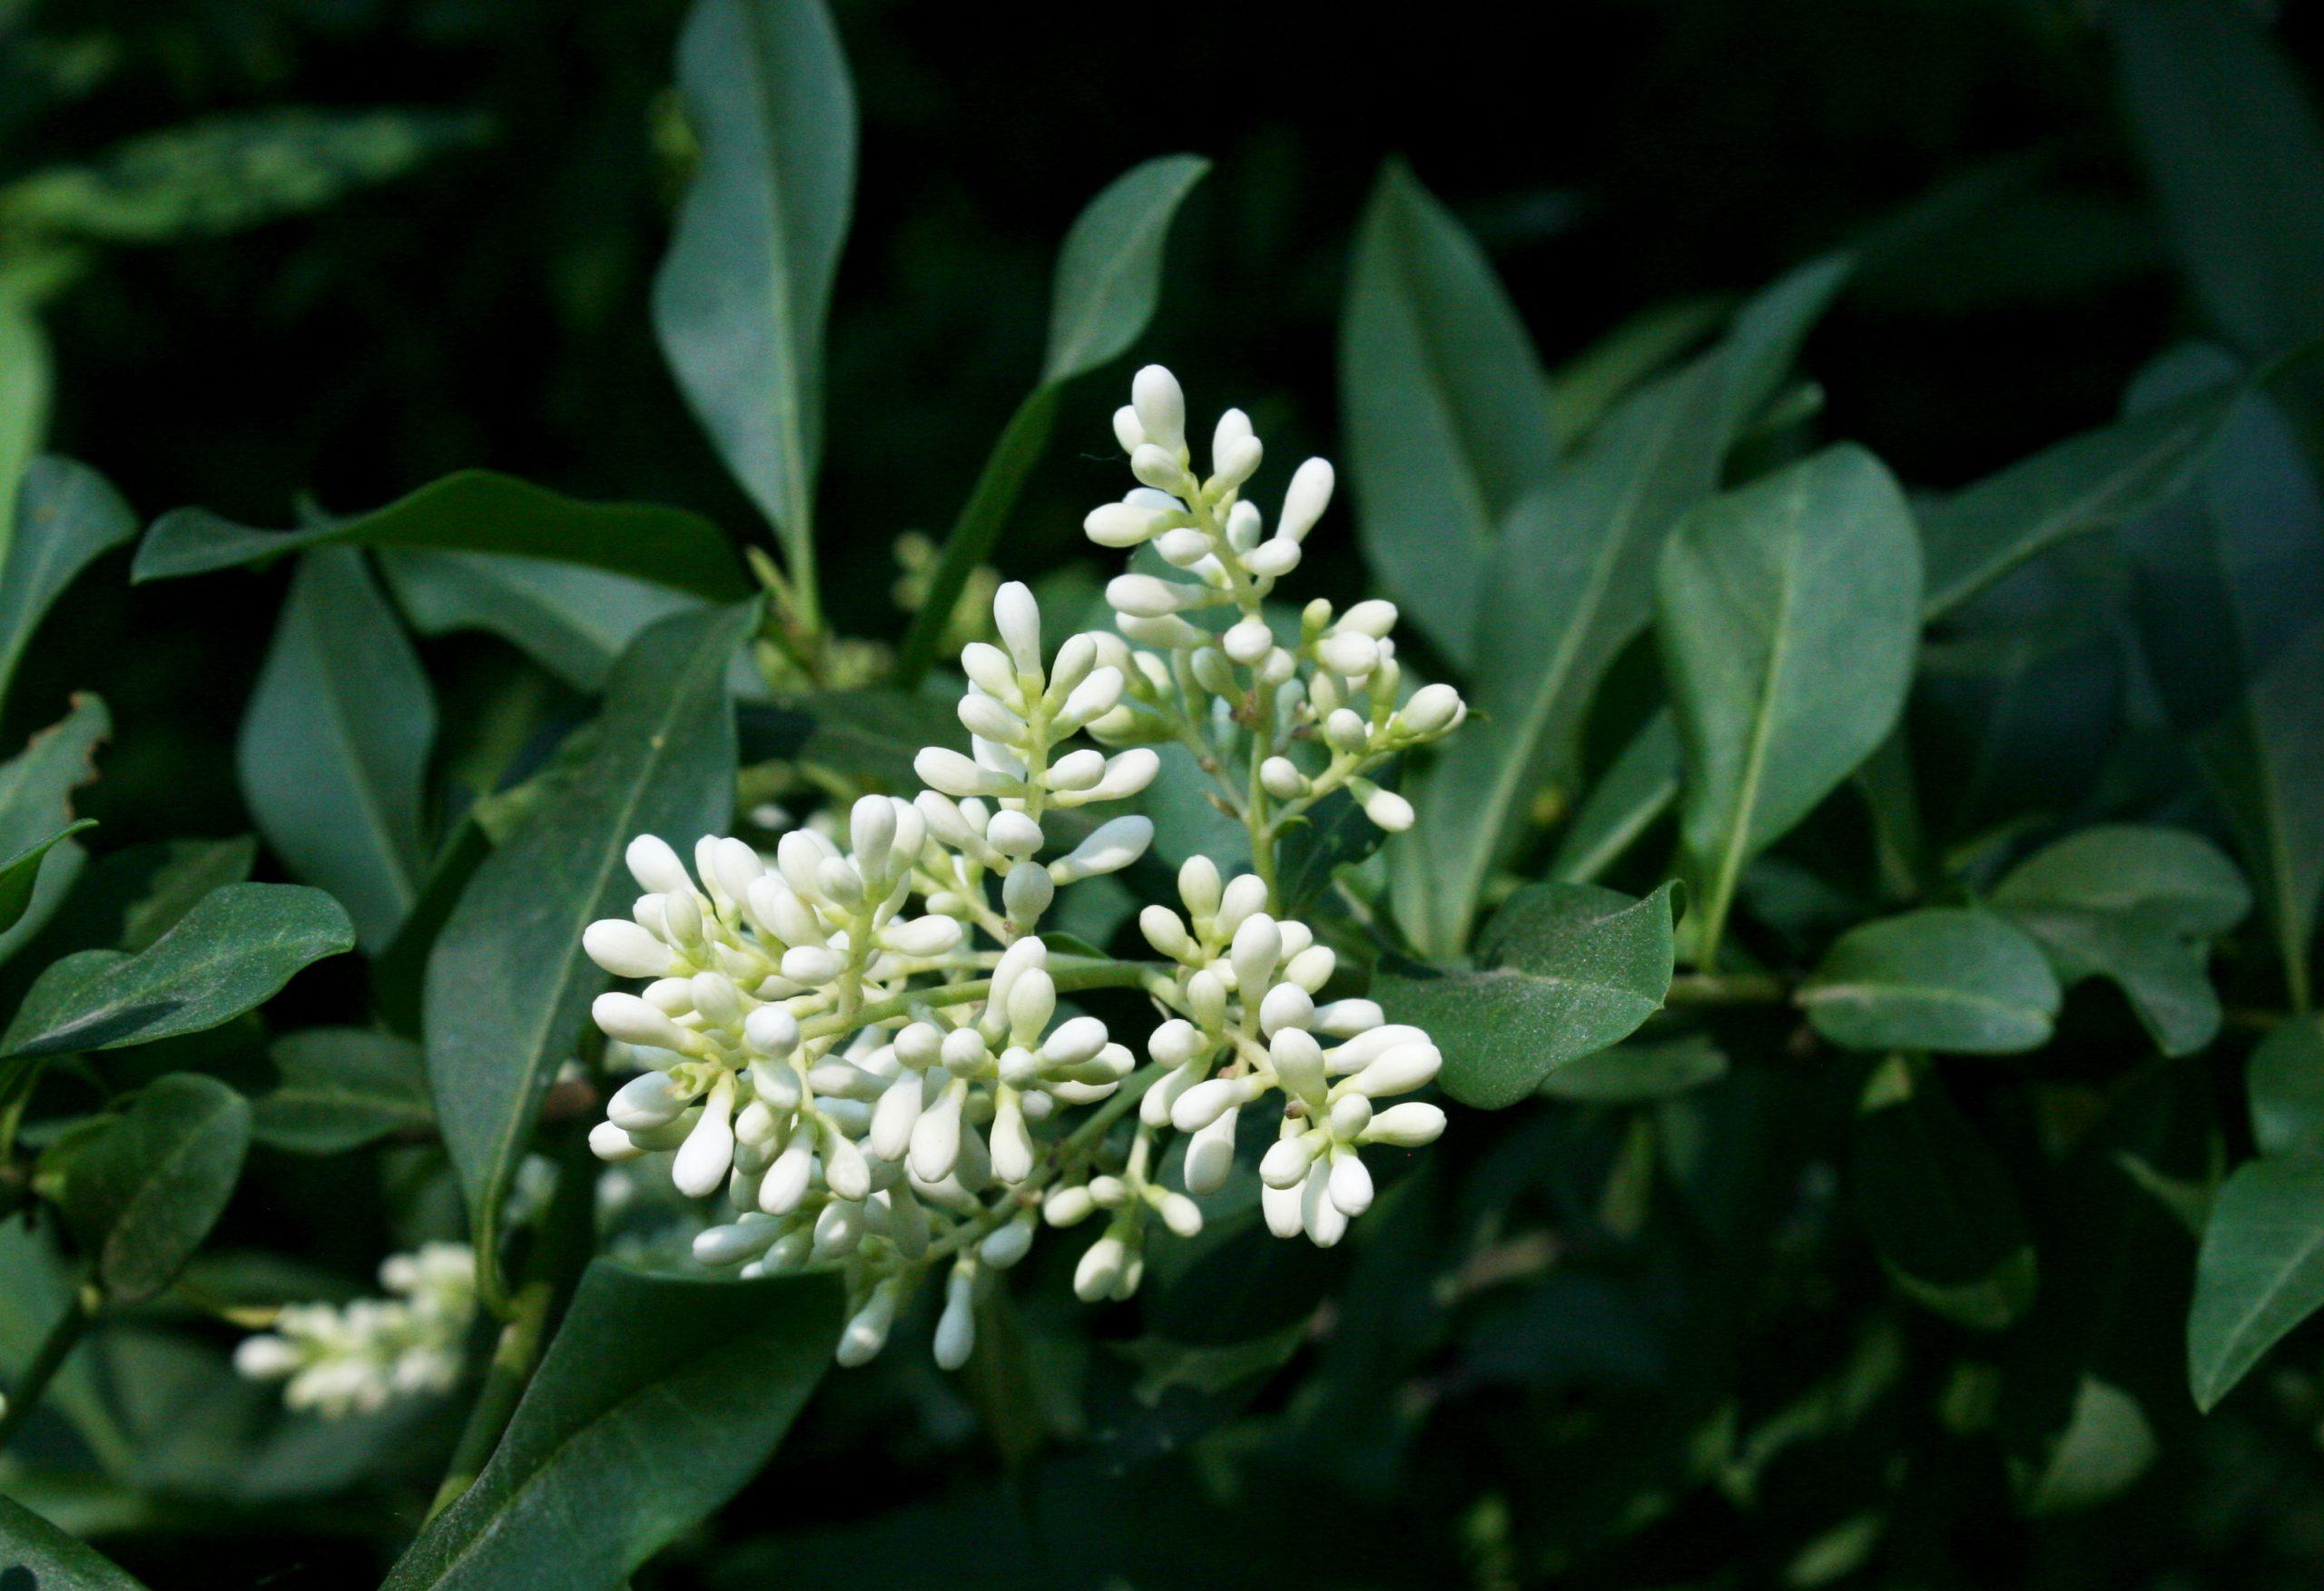 Lemn câinesc Ligustrum ovalifolium